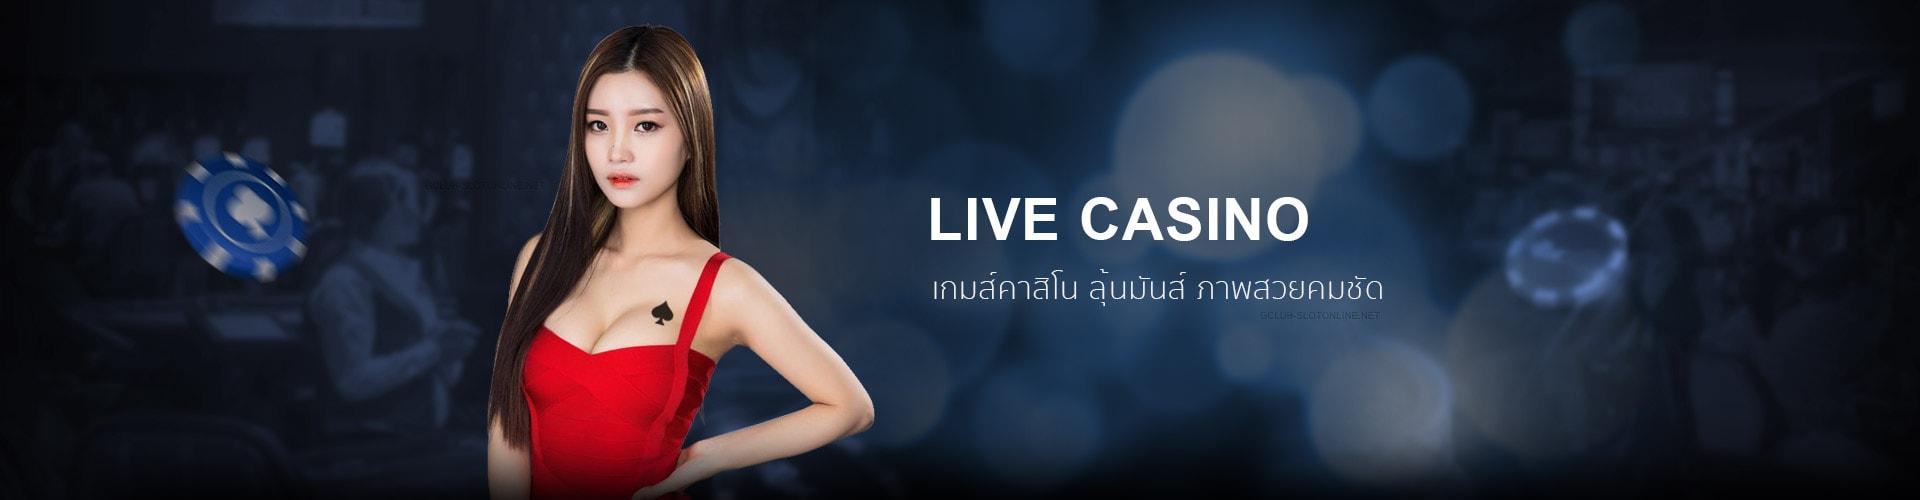 gclub live casino games